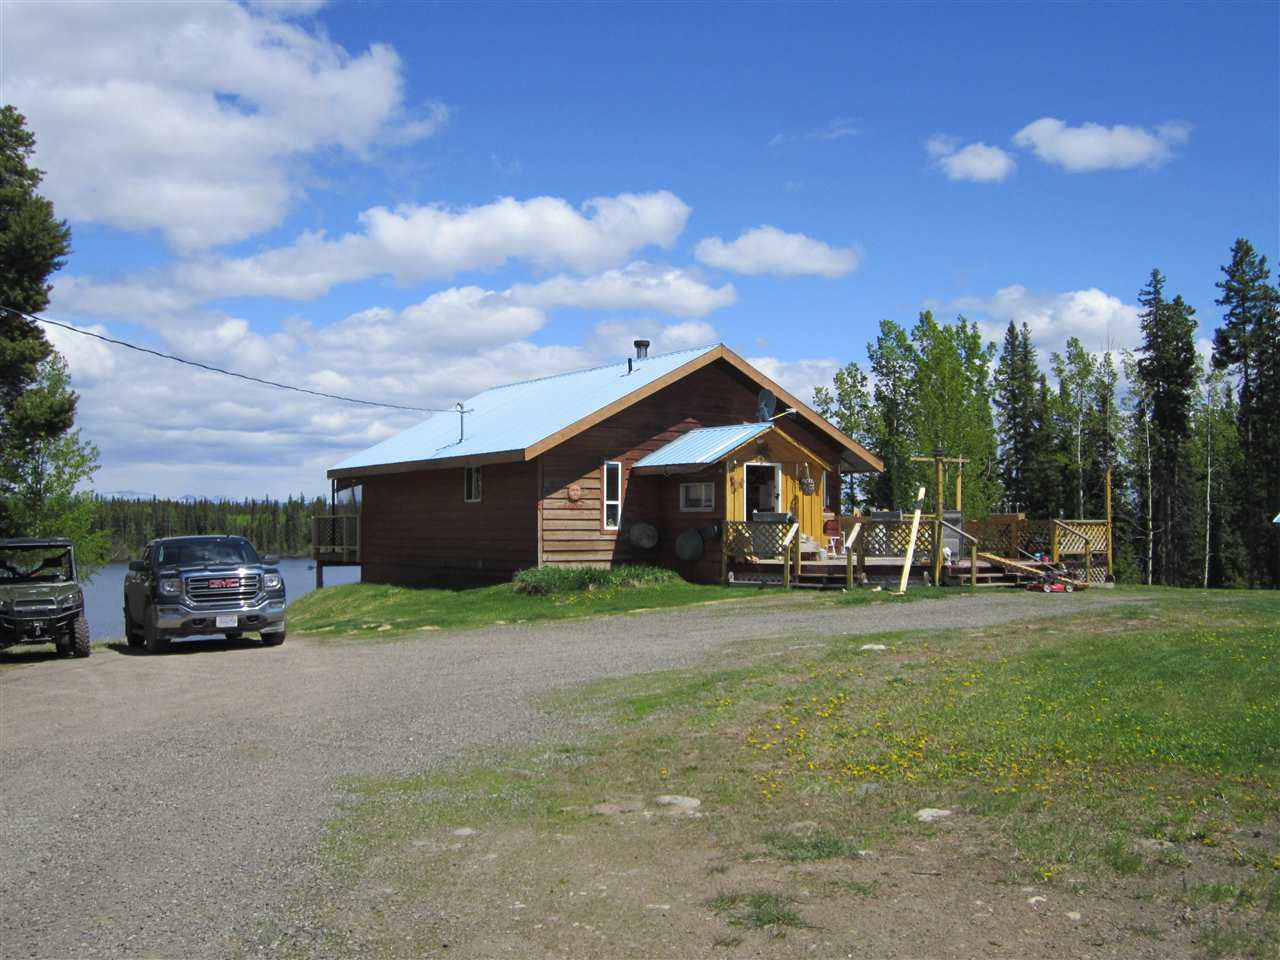 Photo 3: Photos: 3126 ELSEY Road in Williams Lake: Williams Lake - Rural West House for sale (Williams Lake (Zone 27))  : MLS®# R2467730